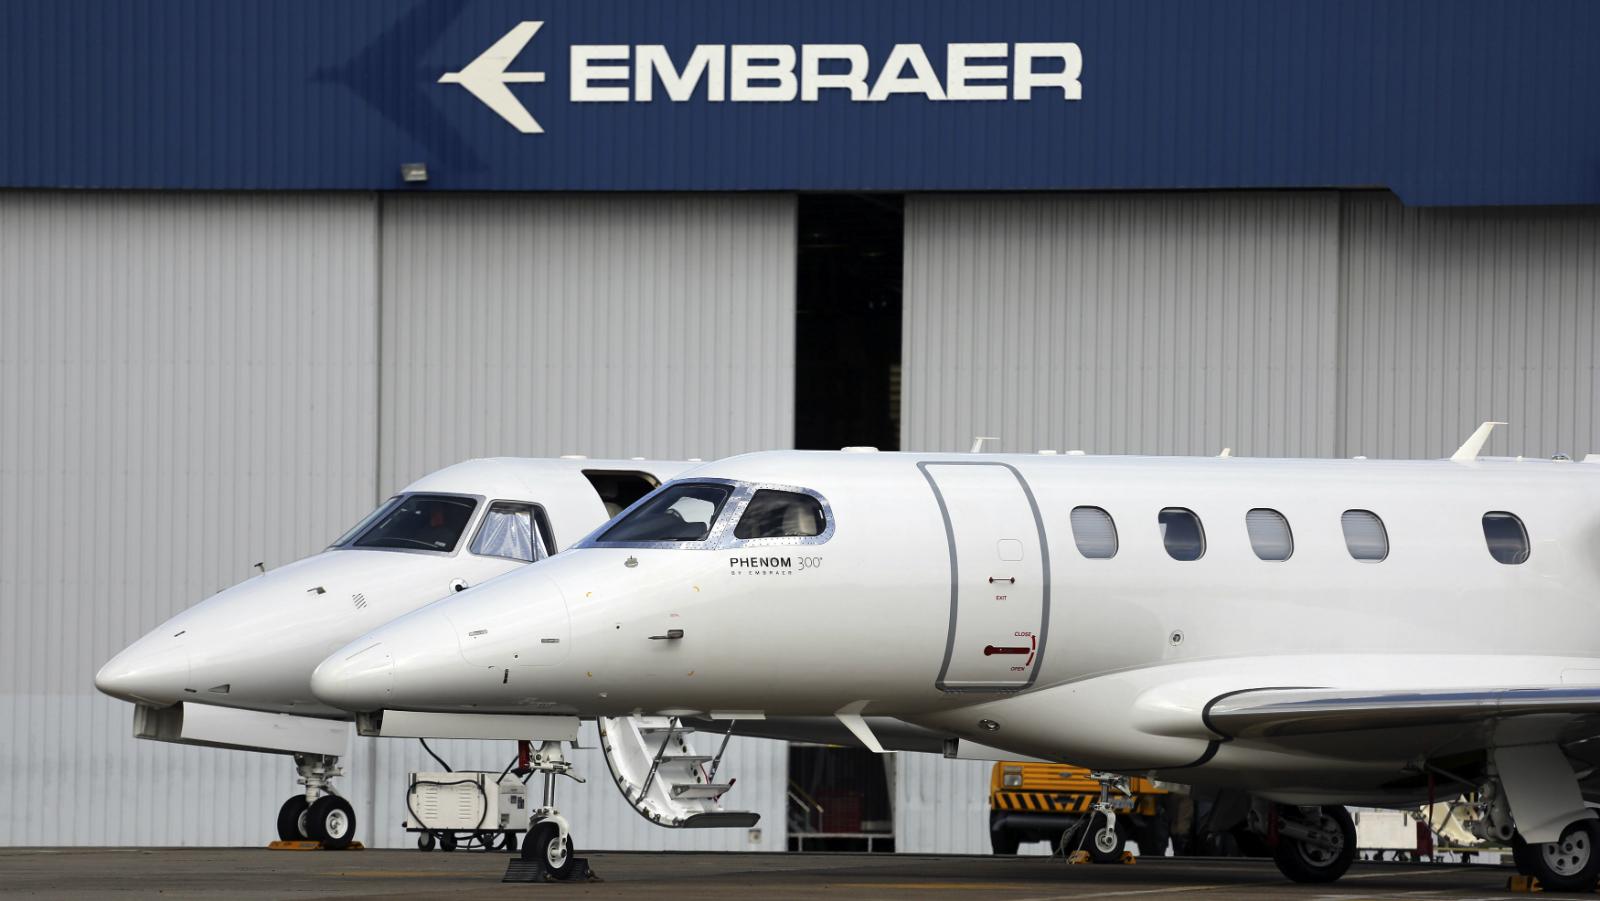 India-Corruption-Narendra Modi-Embraer-Indian Air Force-DRDO-VVIP